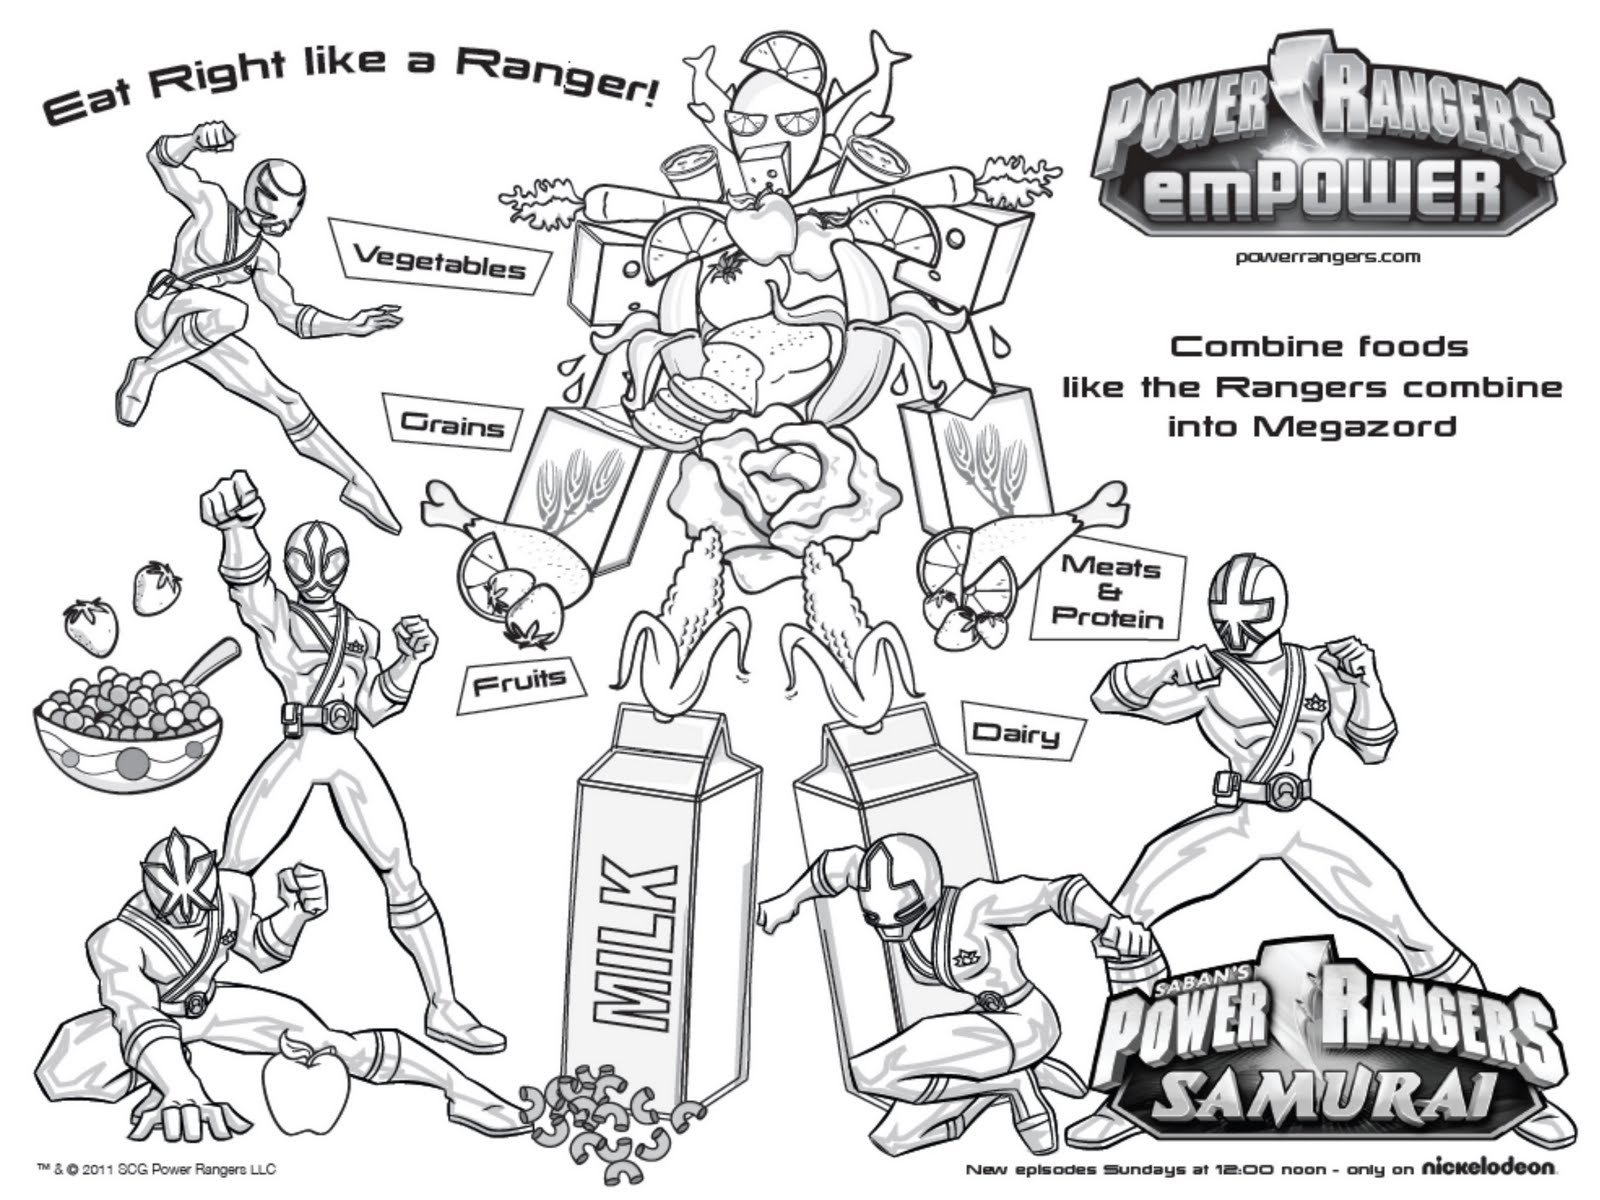 Power Rangers Samurai Activities Anime Sentinel blogs on Anime